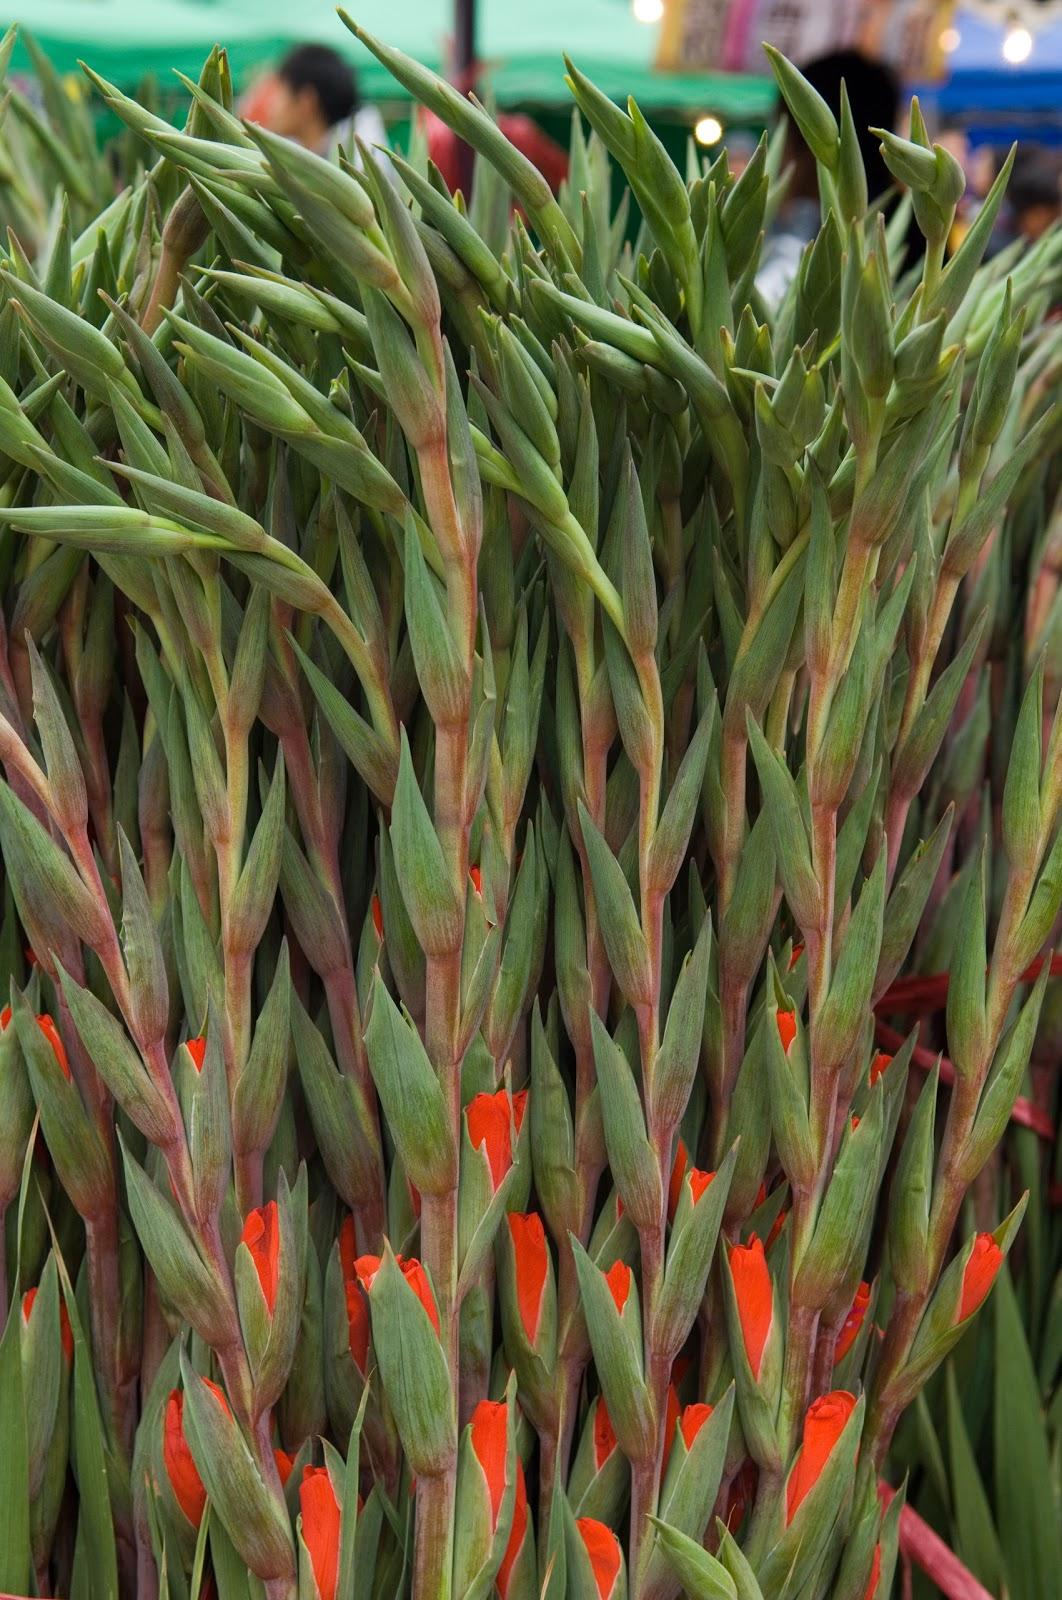 flowers for flower lovers Gladiolus flowers